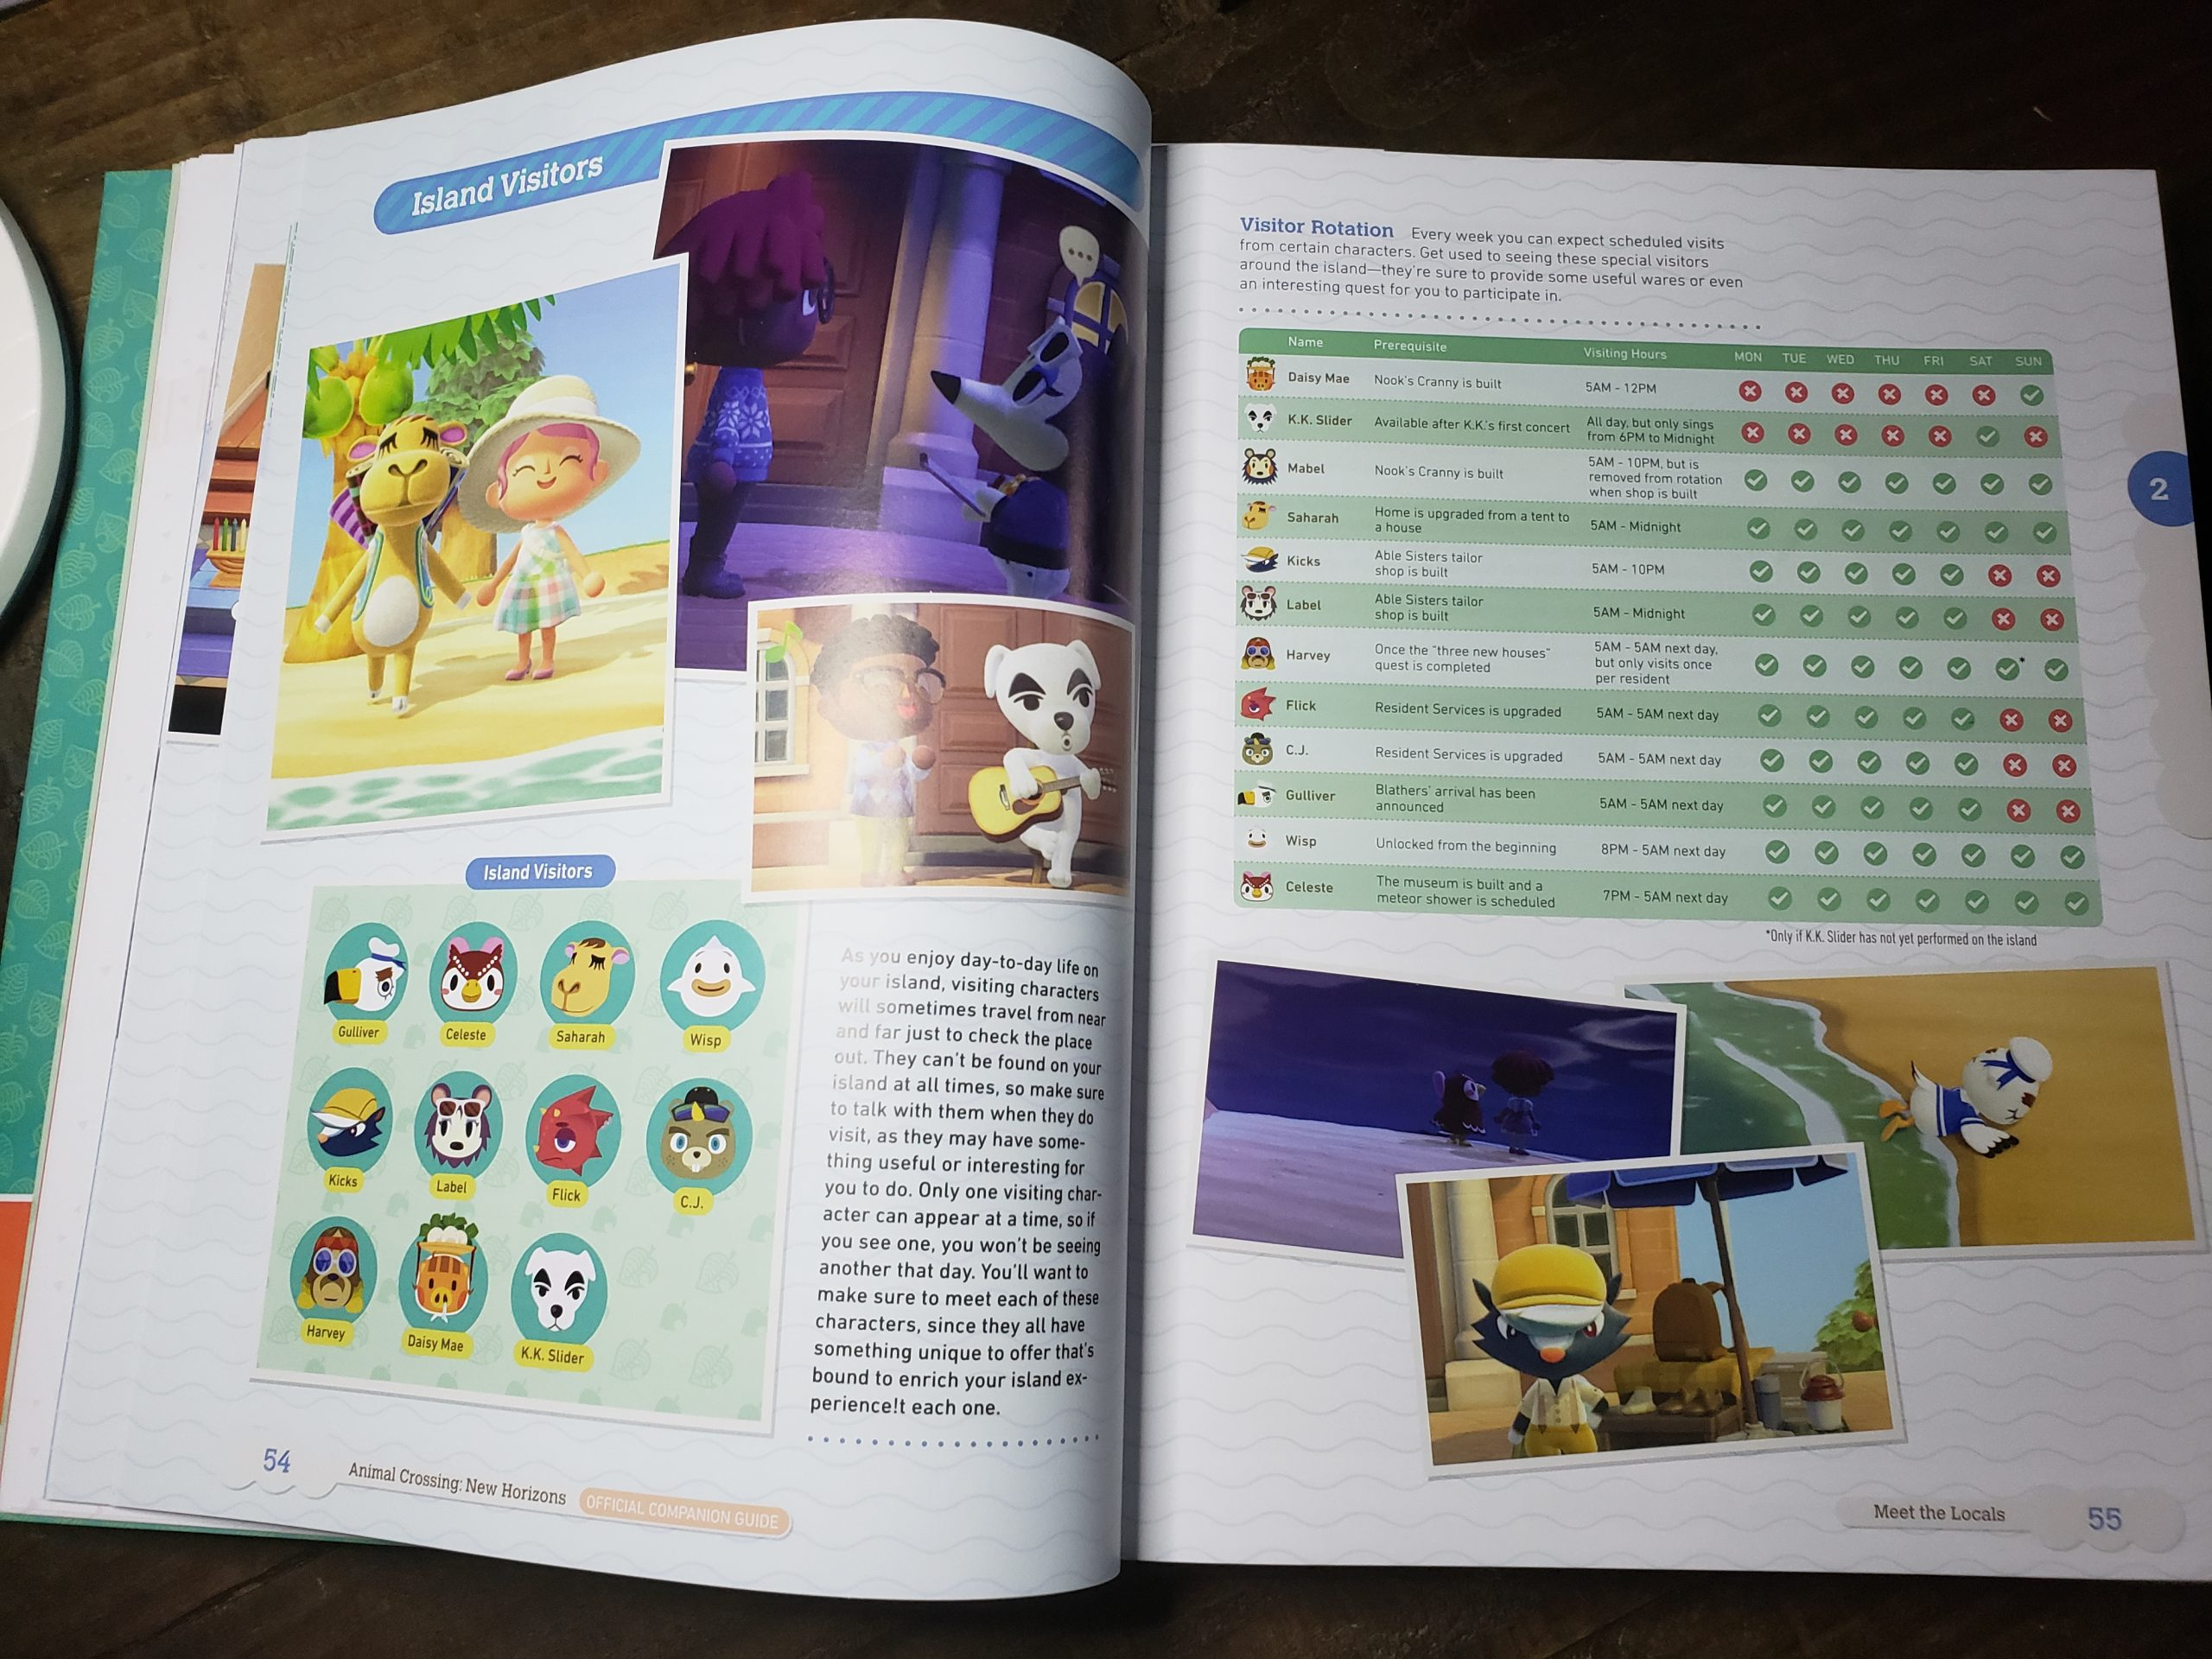 Animal Crossing companion guide